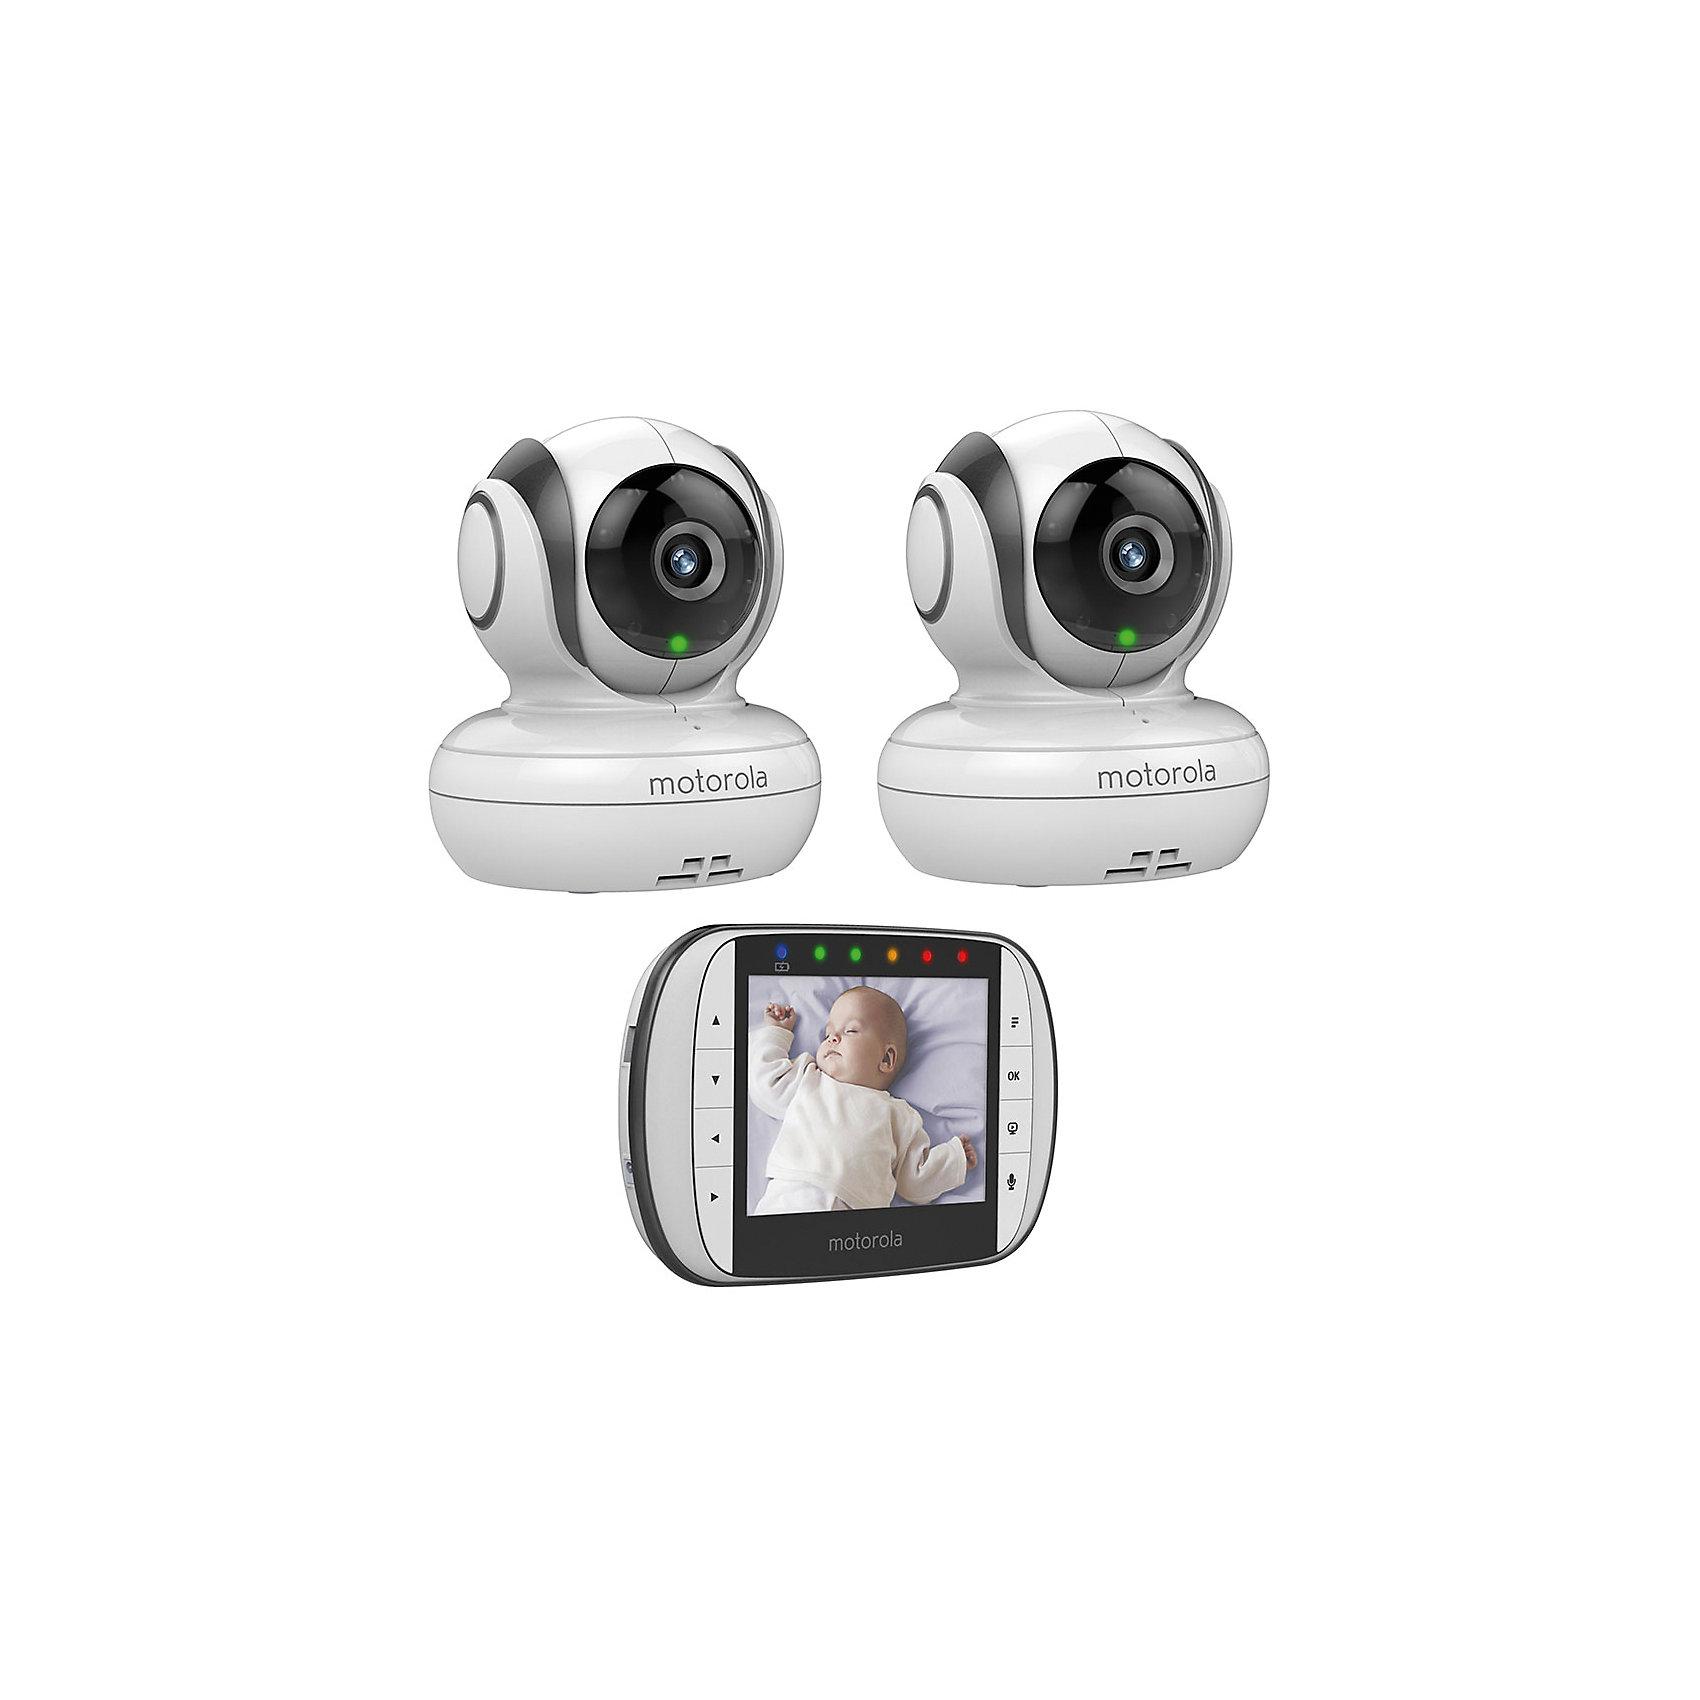 Комплект: видеоняня MBP36S+доп.камера MBP36SBU, Motorola<br><br>Ширина мм: 250<br>Глубина мм: 120<br>Высота мм: 250<br>Вес г: 1275<br>Возраст от месяцев: 0<br>Возраст до месяцев: 12<br>Пол: Унисекс<br>Возраст: Детский<br>SKU: 5215498